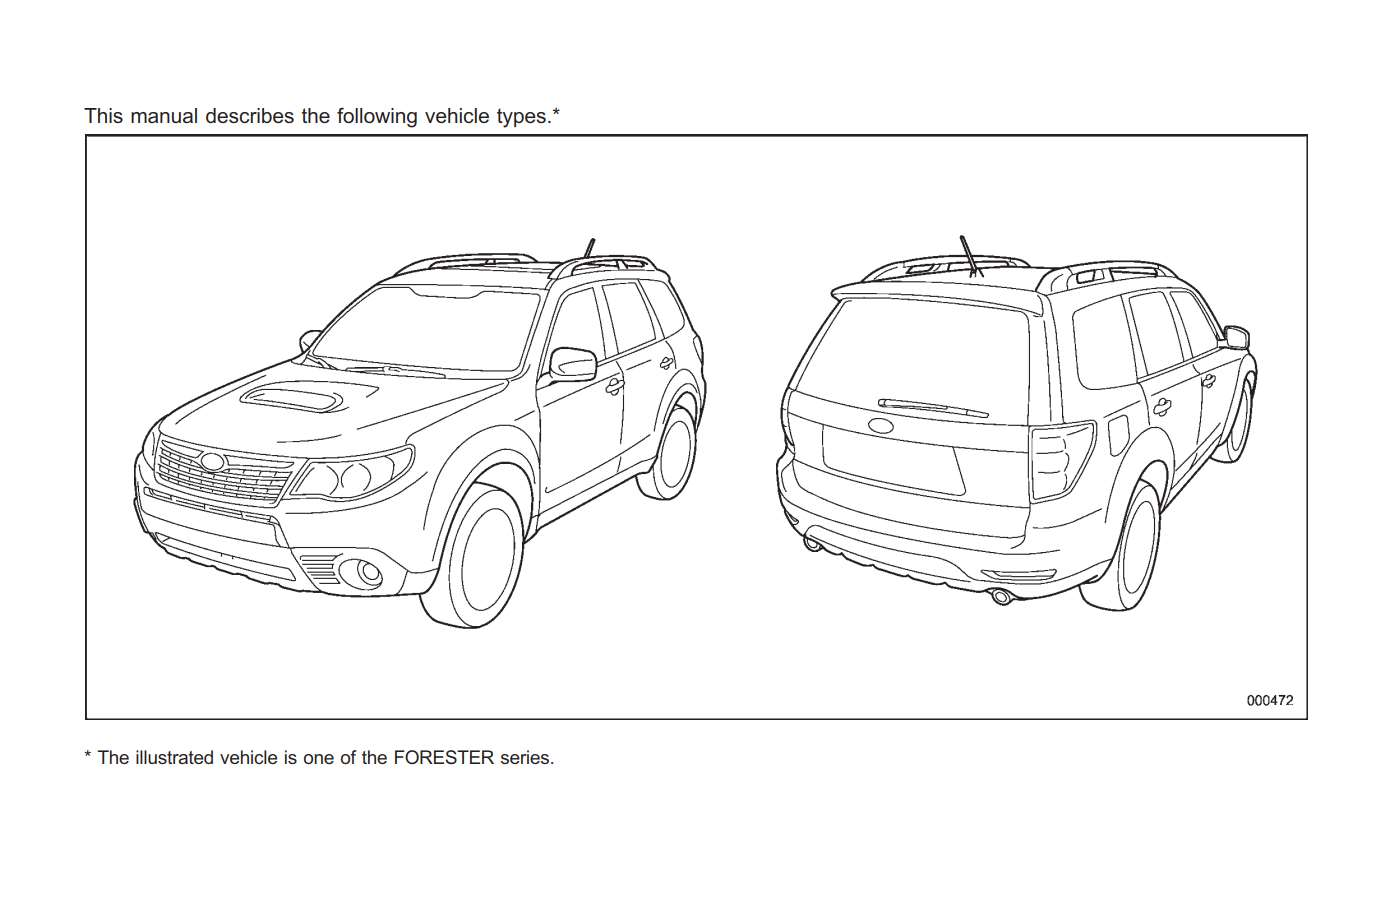 Subaru Forester 2009 Owner's Manual